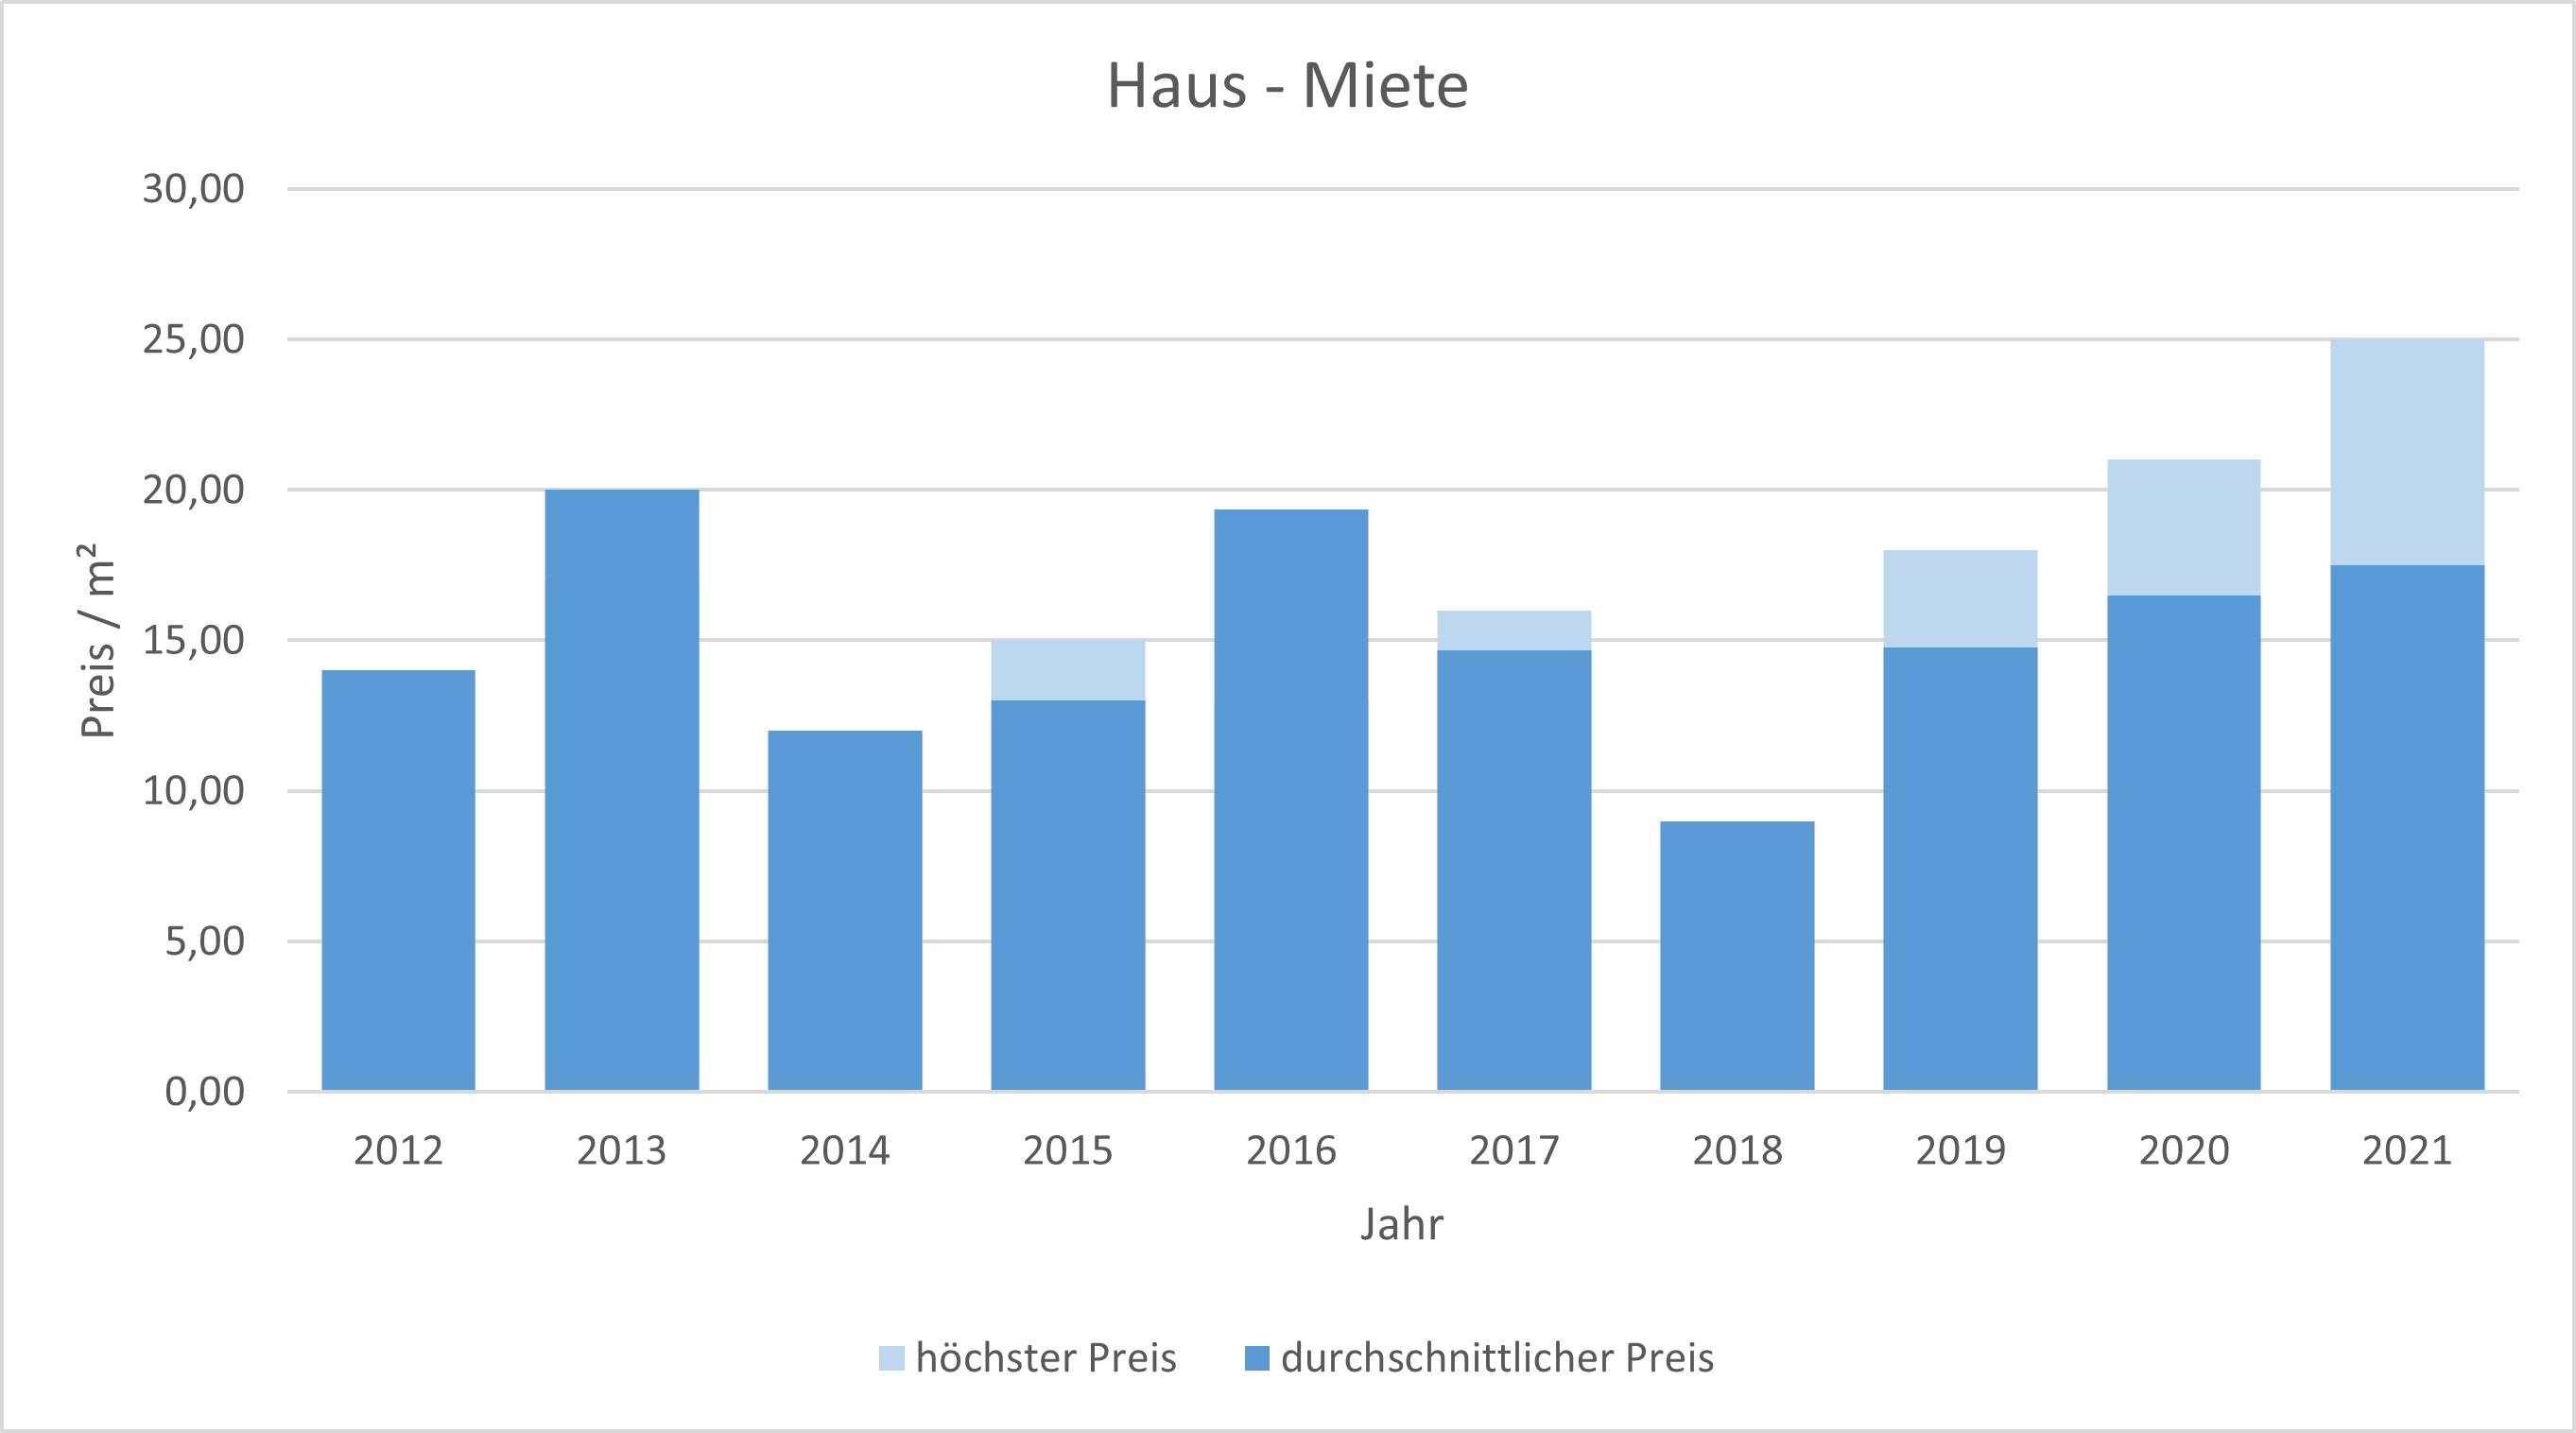 München - Waldtrudering Haus mieten vermieten Preis Bewertung Makler 2019 2020 2021 www.happy-immo.de